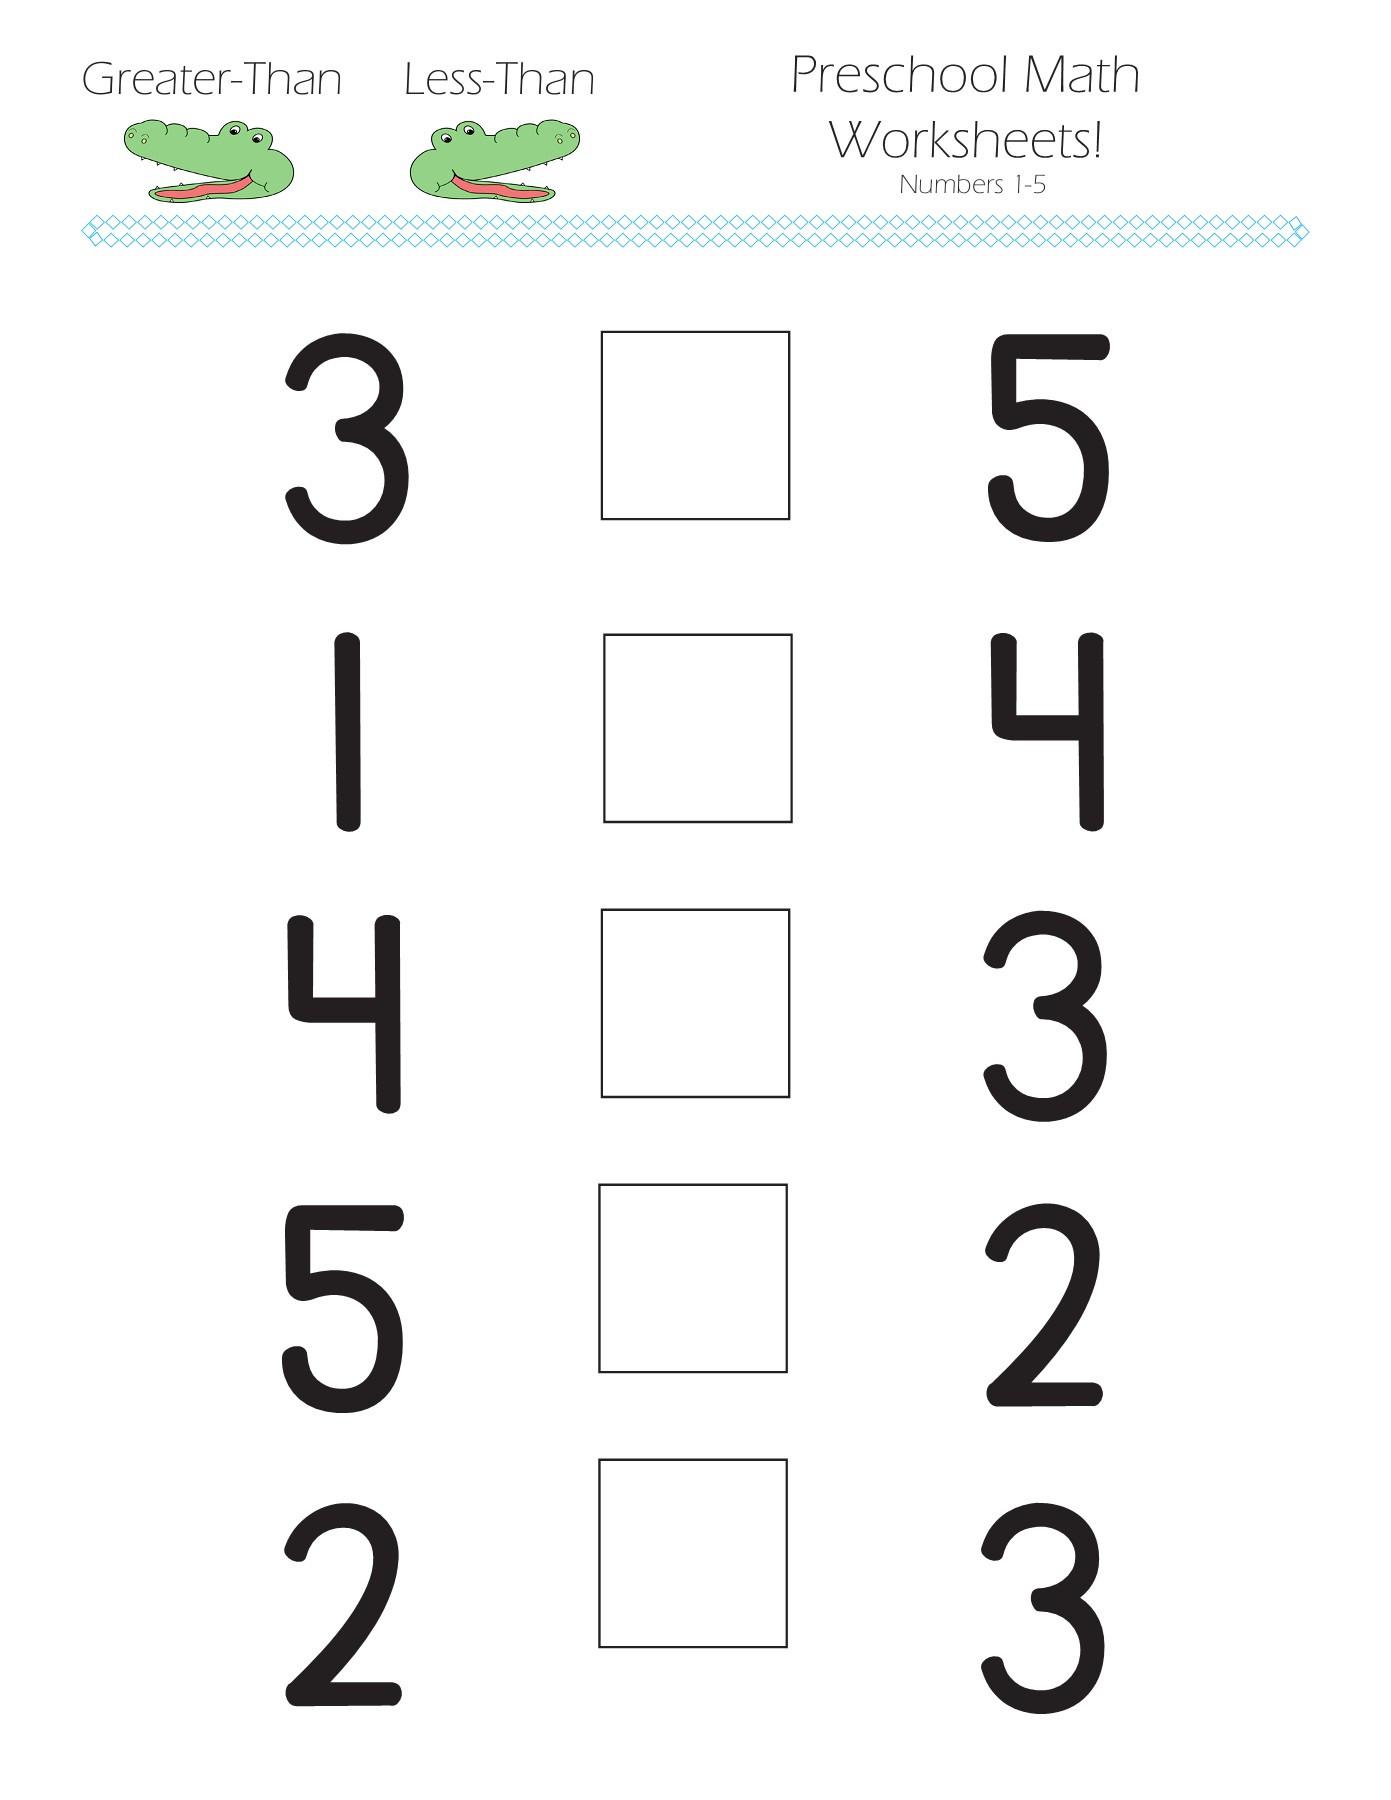 Greaterthan Lessthan Preschool Math Worksheets